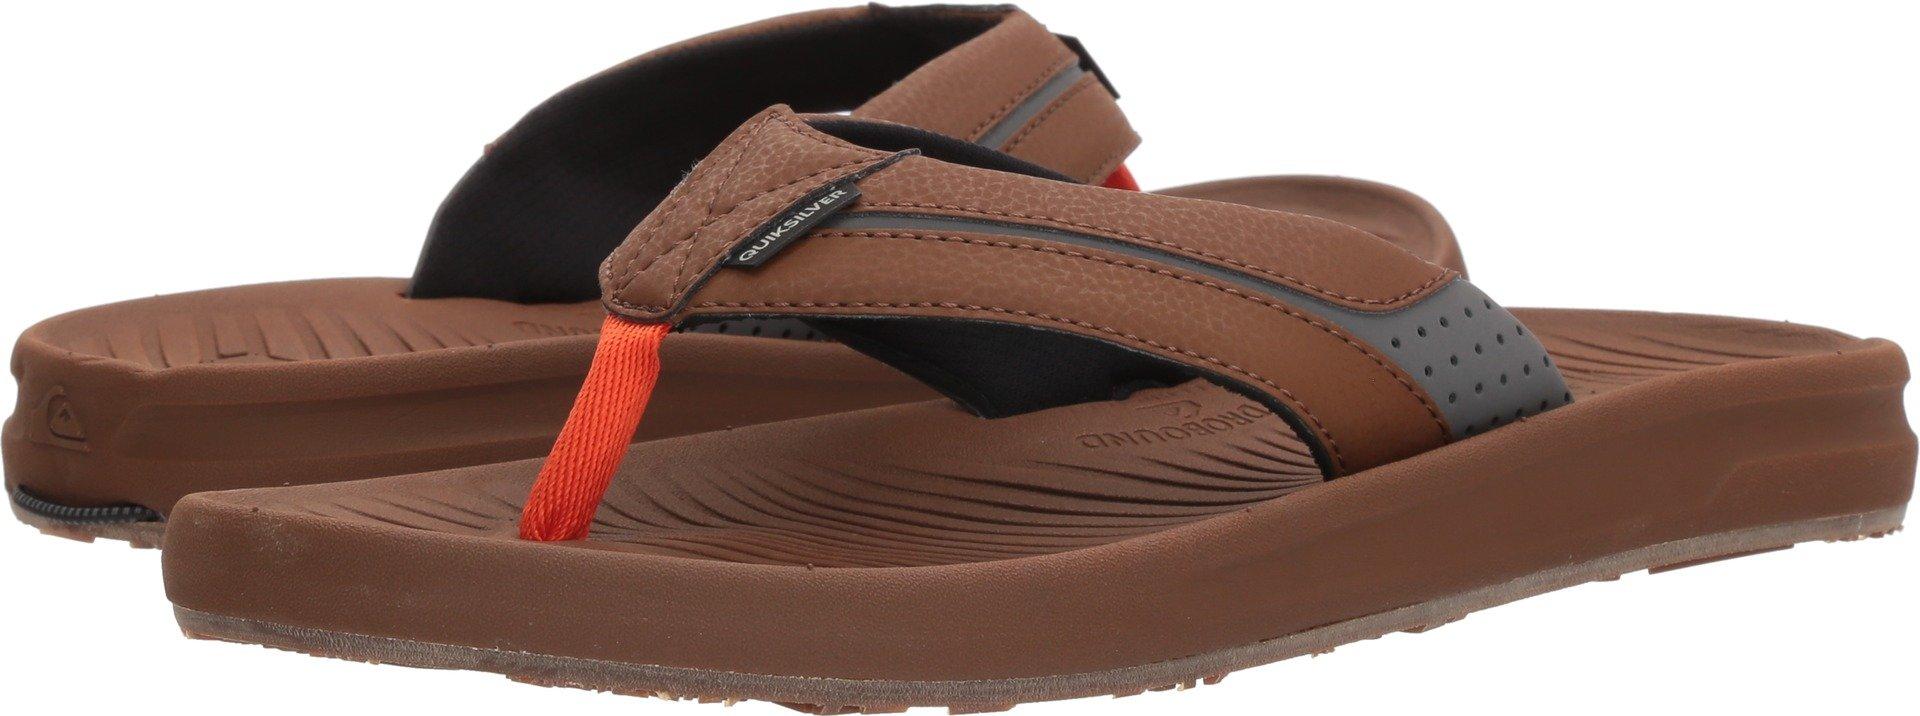 Quiksilver Men's Travel Oasis Sandal, Brown/Brown/Orange, 8 M US